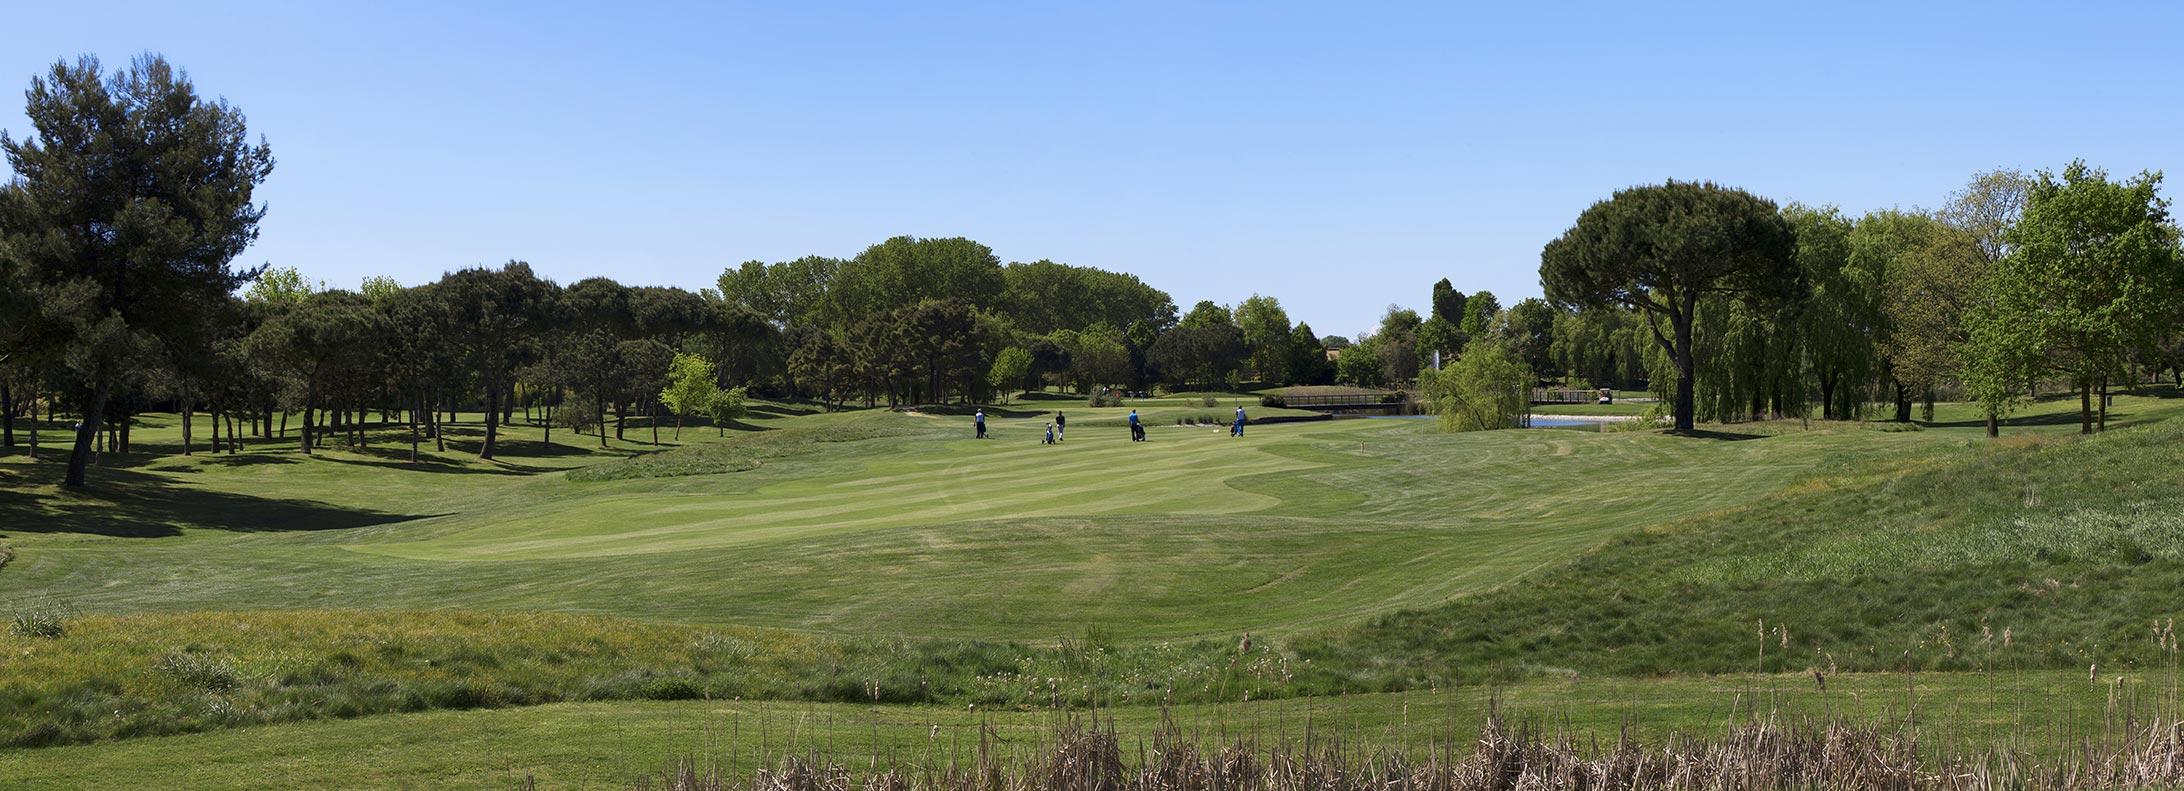 golf_club_Lignano_Friuli-Venezia-Giulia_3